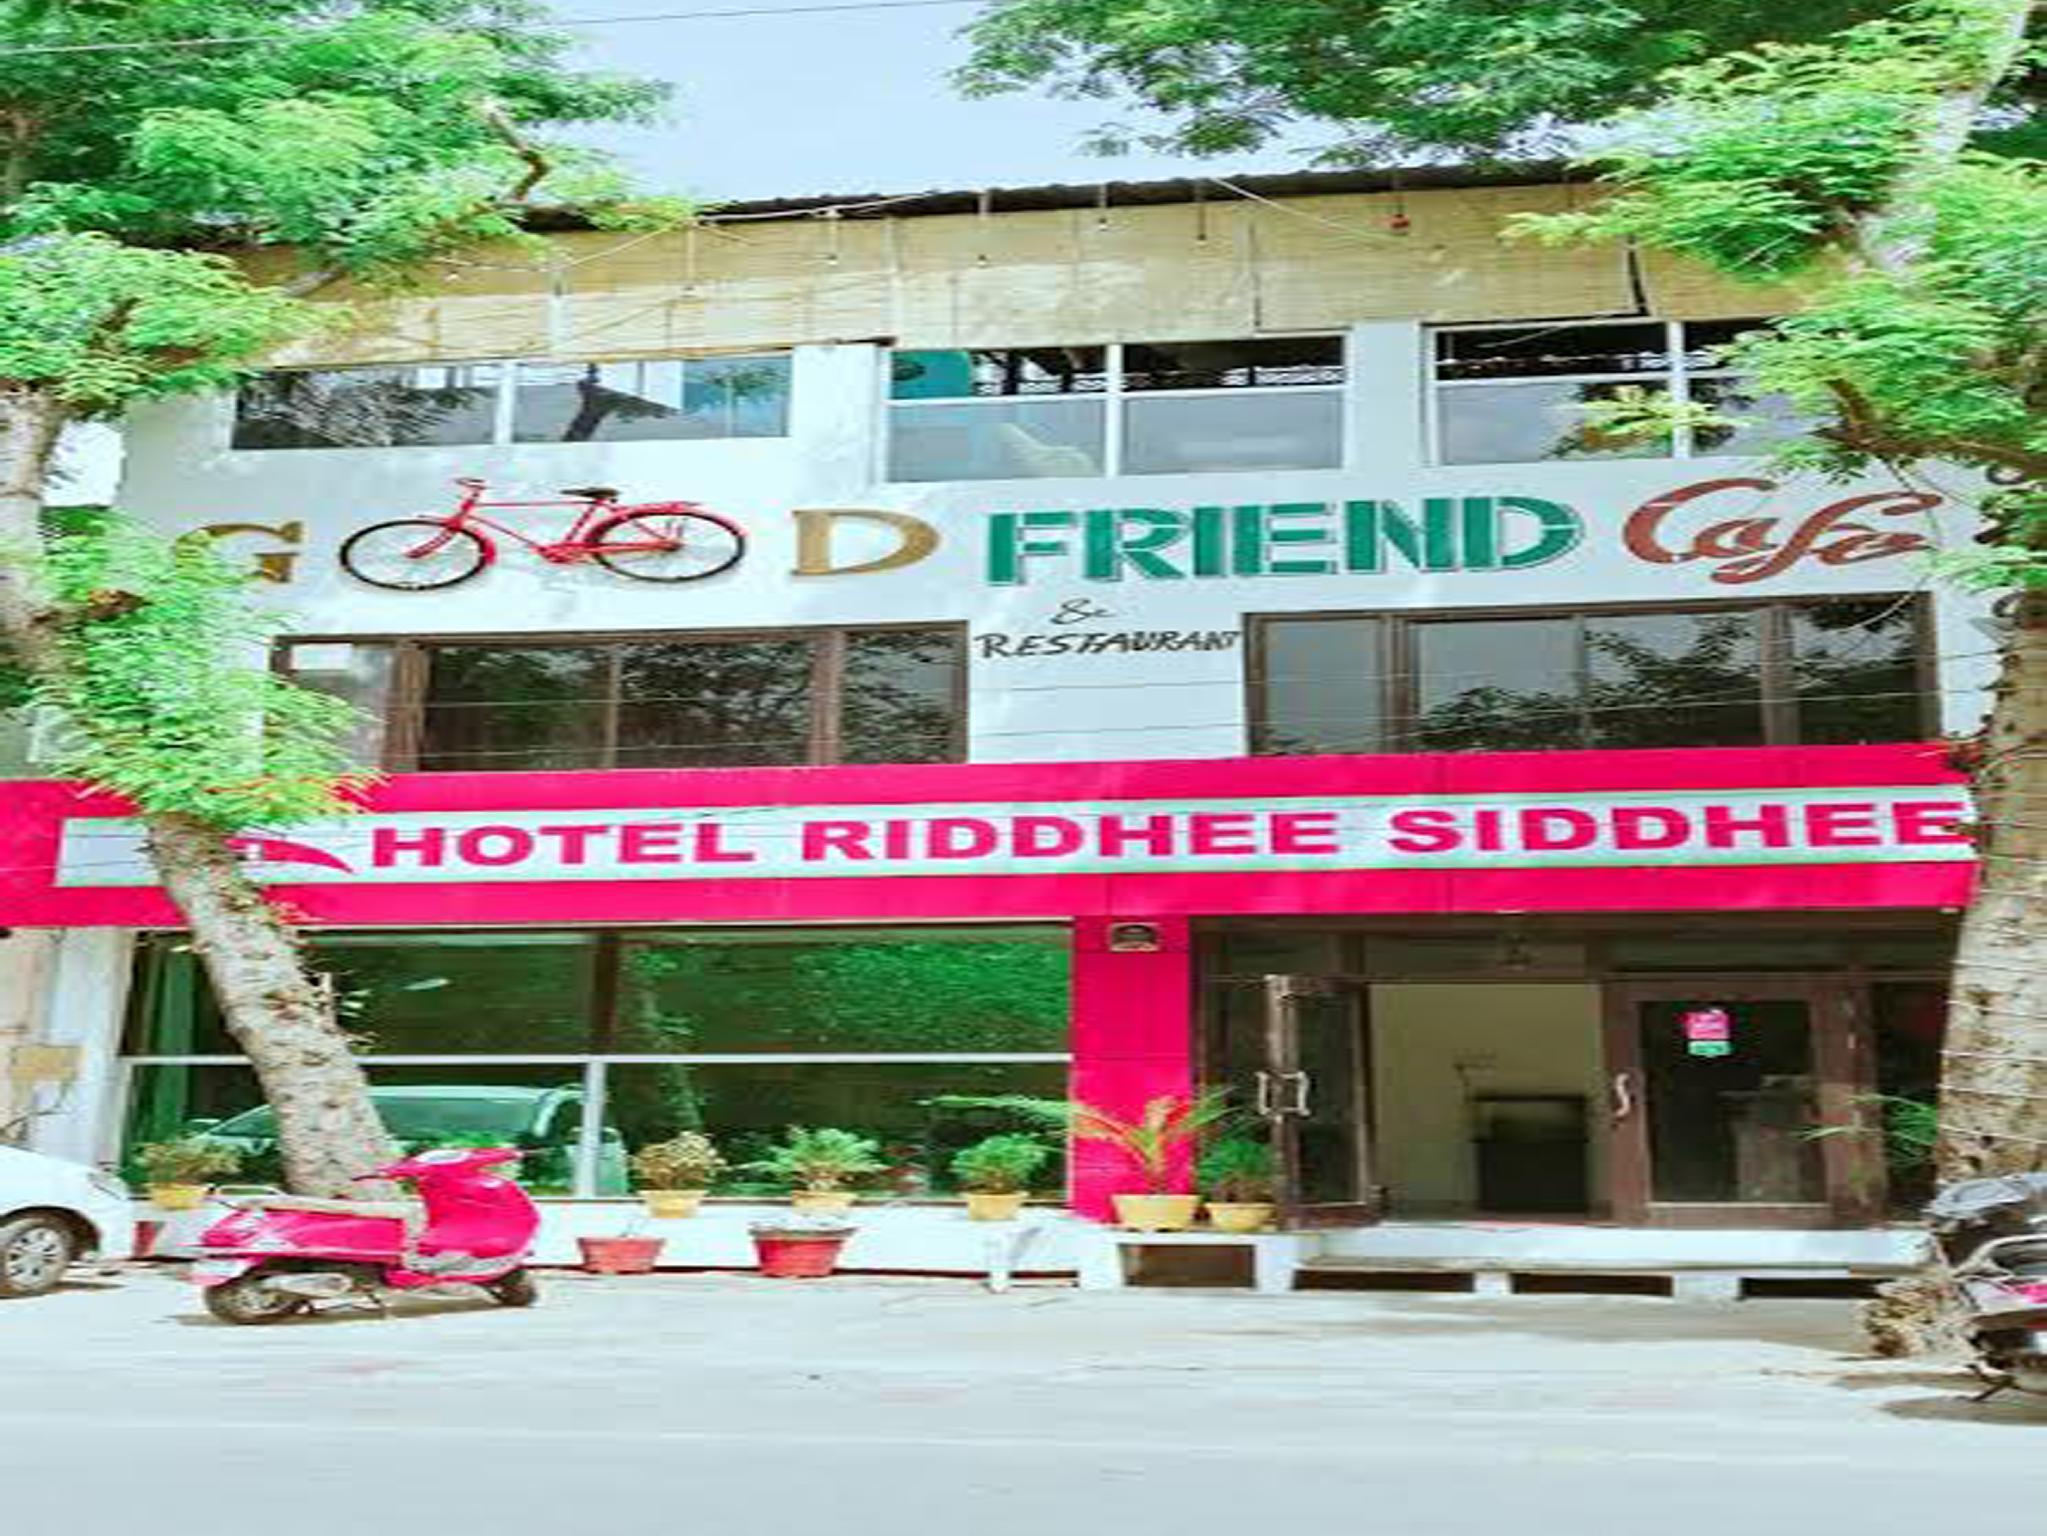 Hotel Riddhee Siddhee, Agra